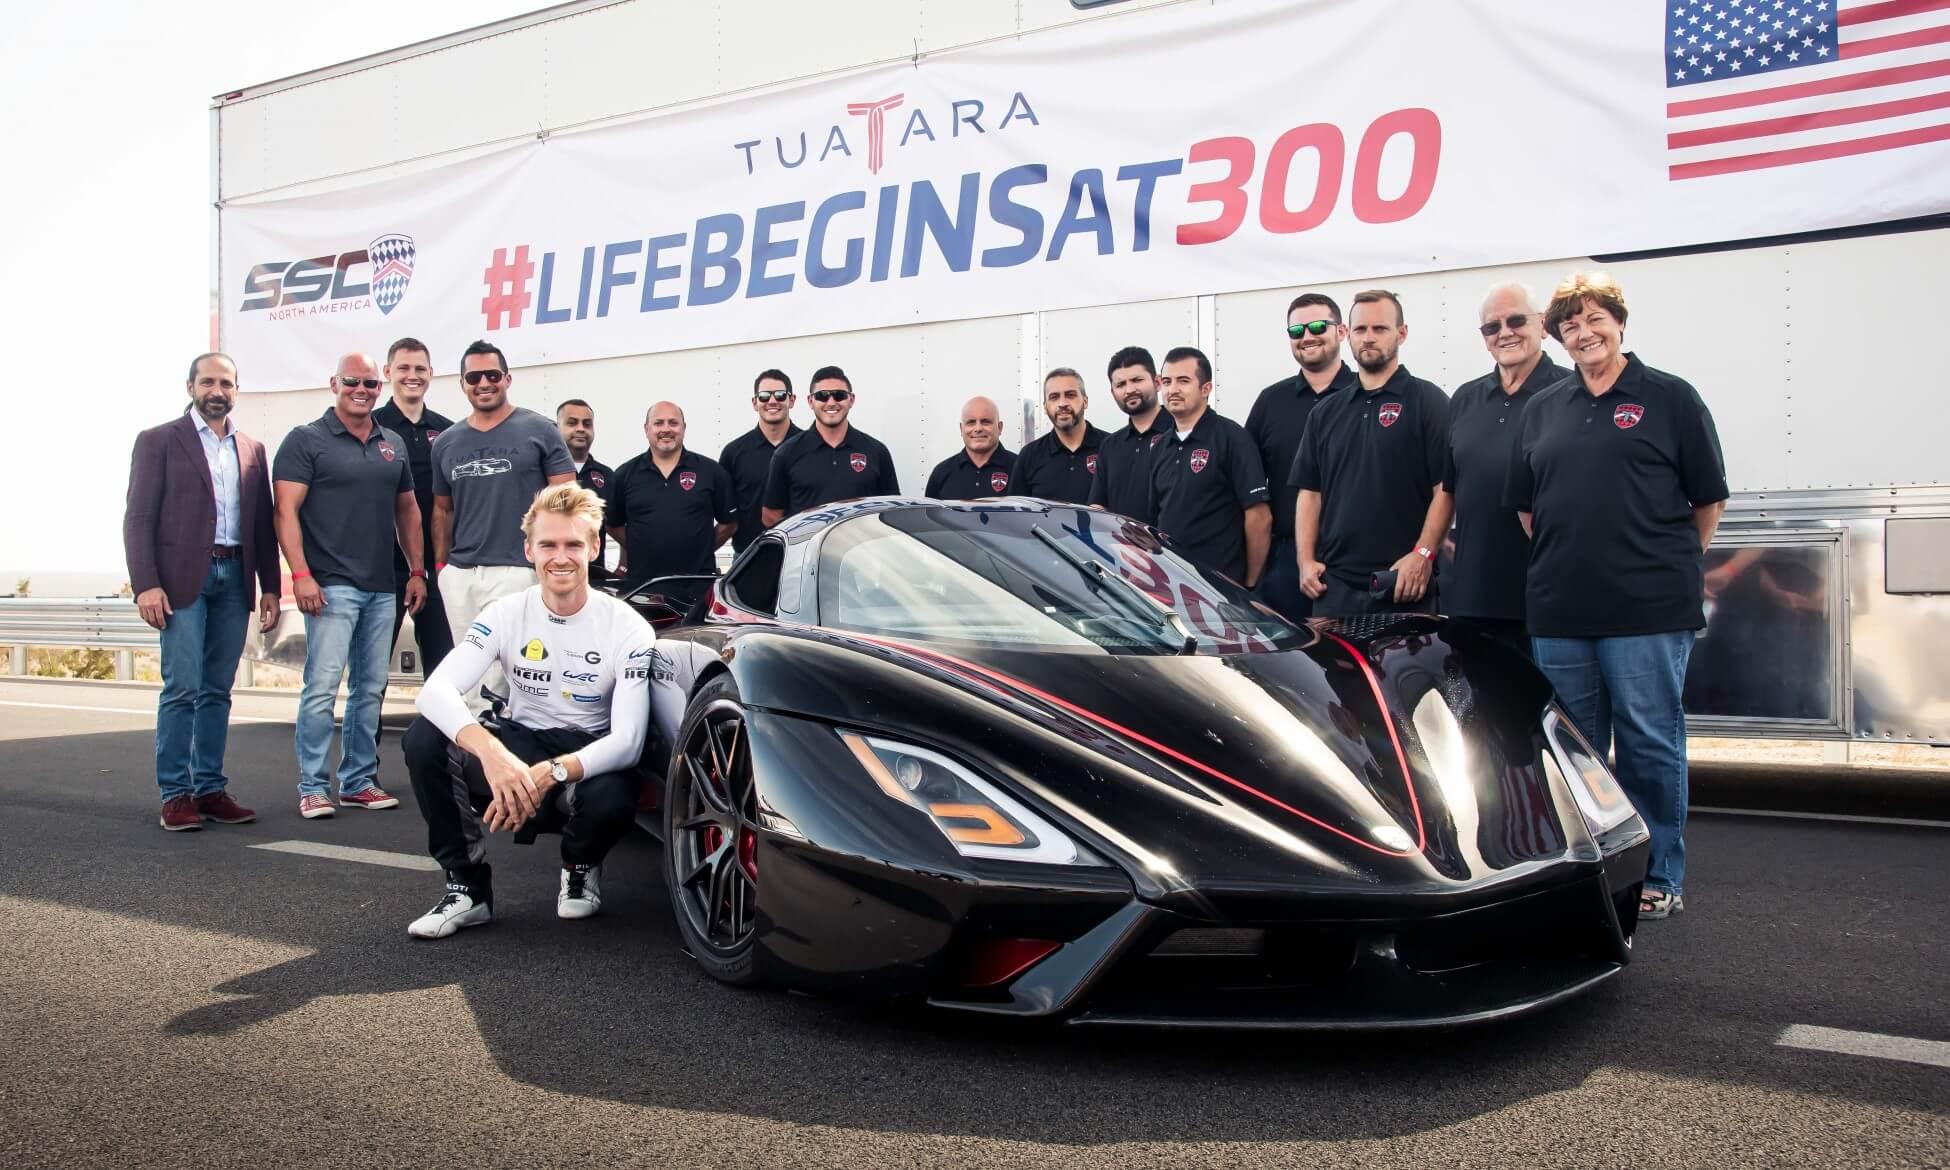 World's fastest car team